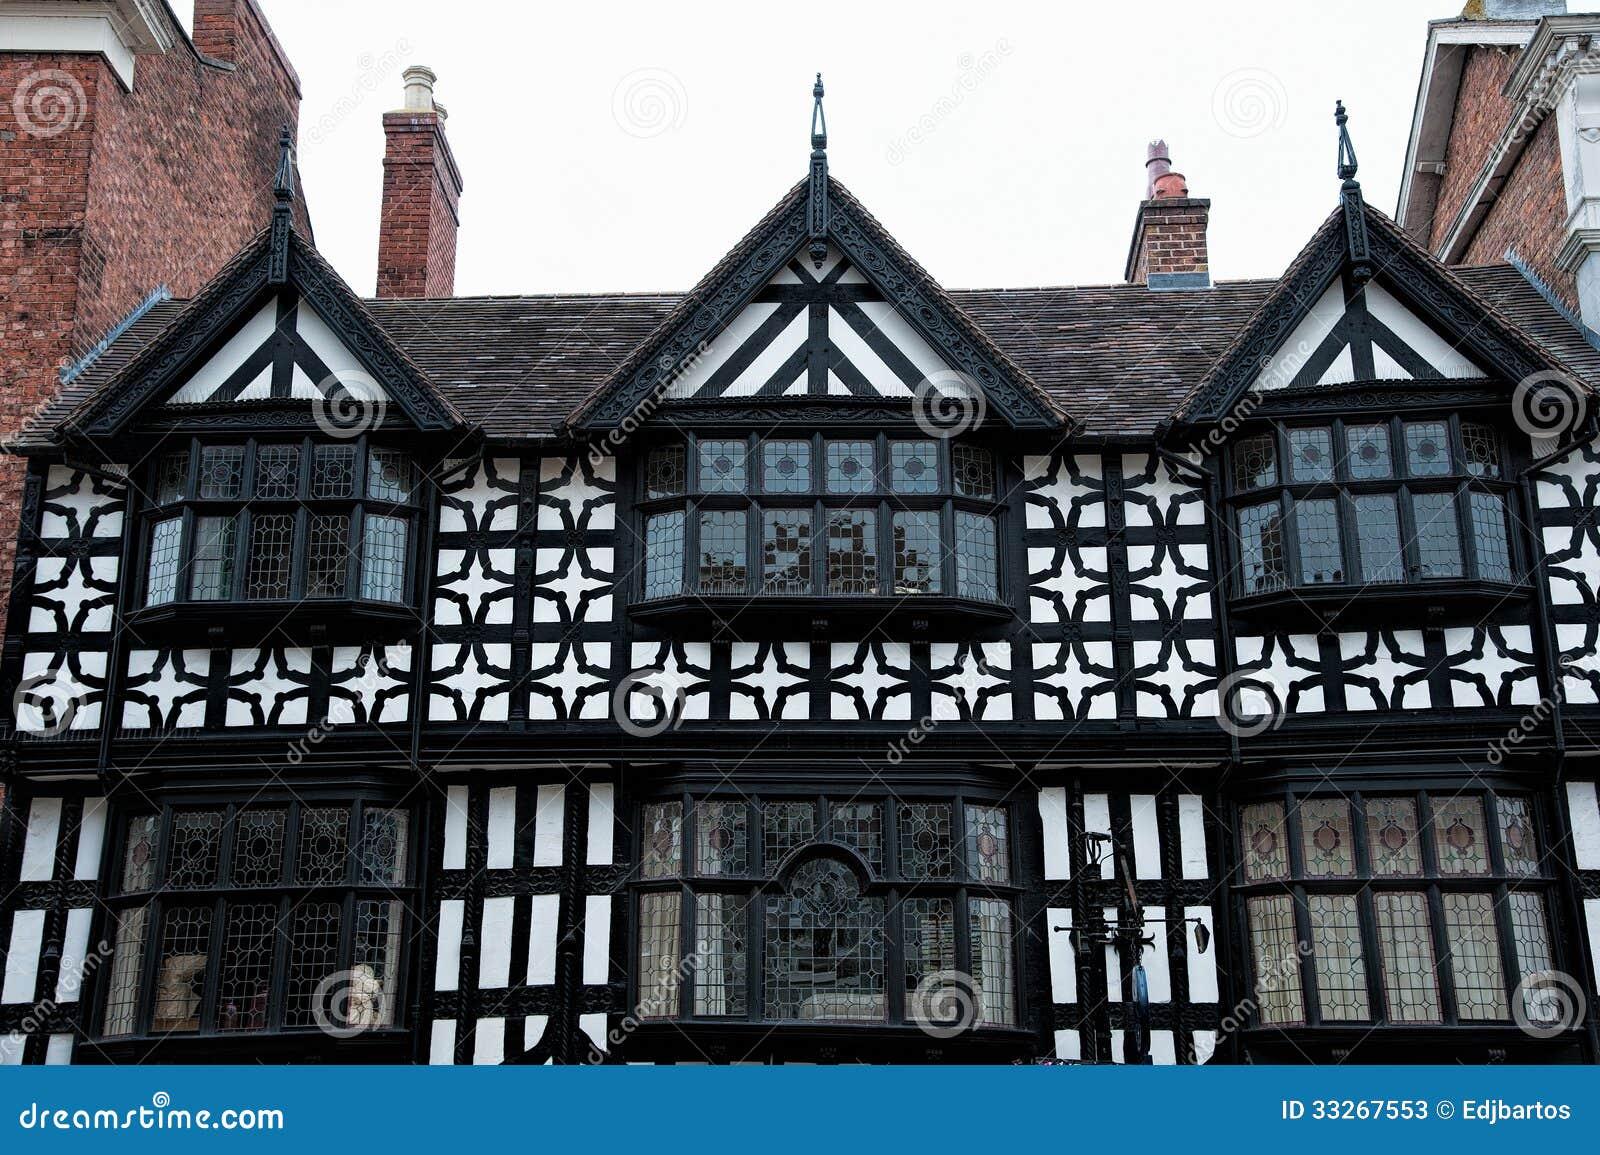 Tudor Buildings Stock Photos Image 33267553